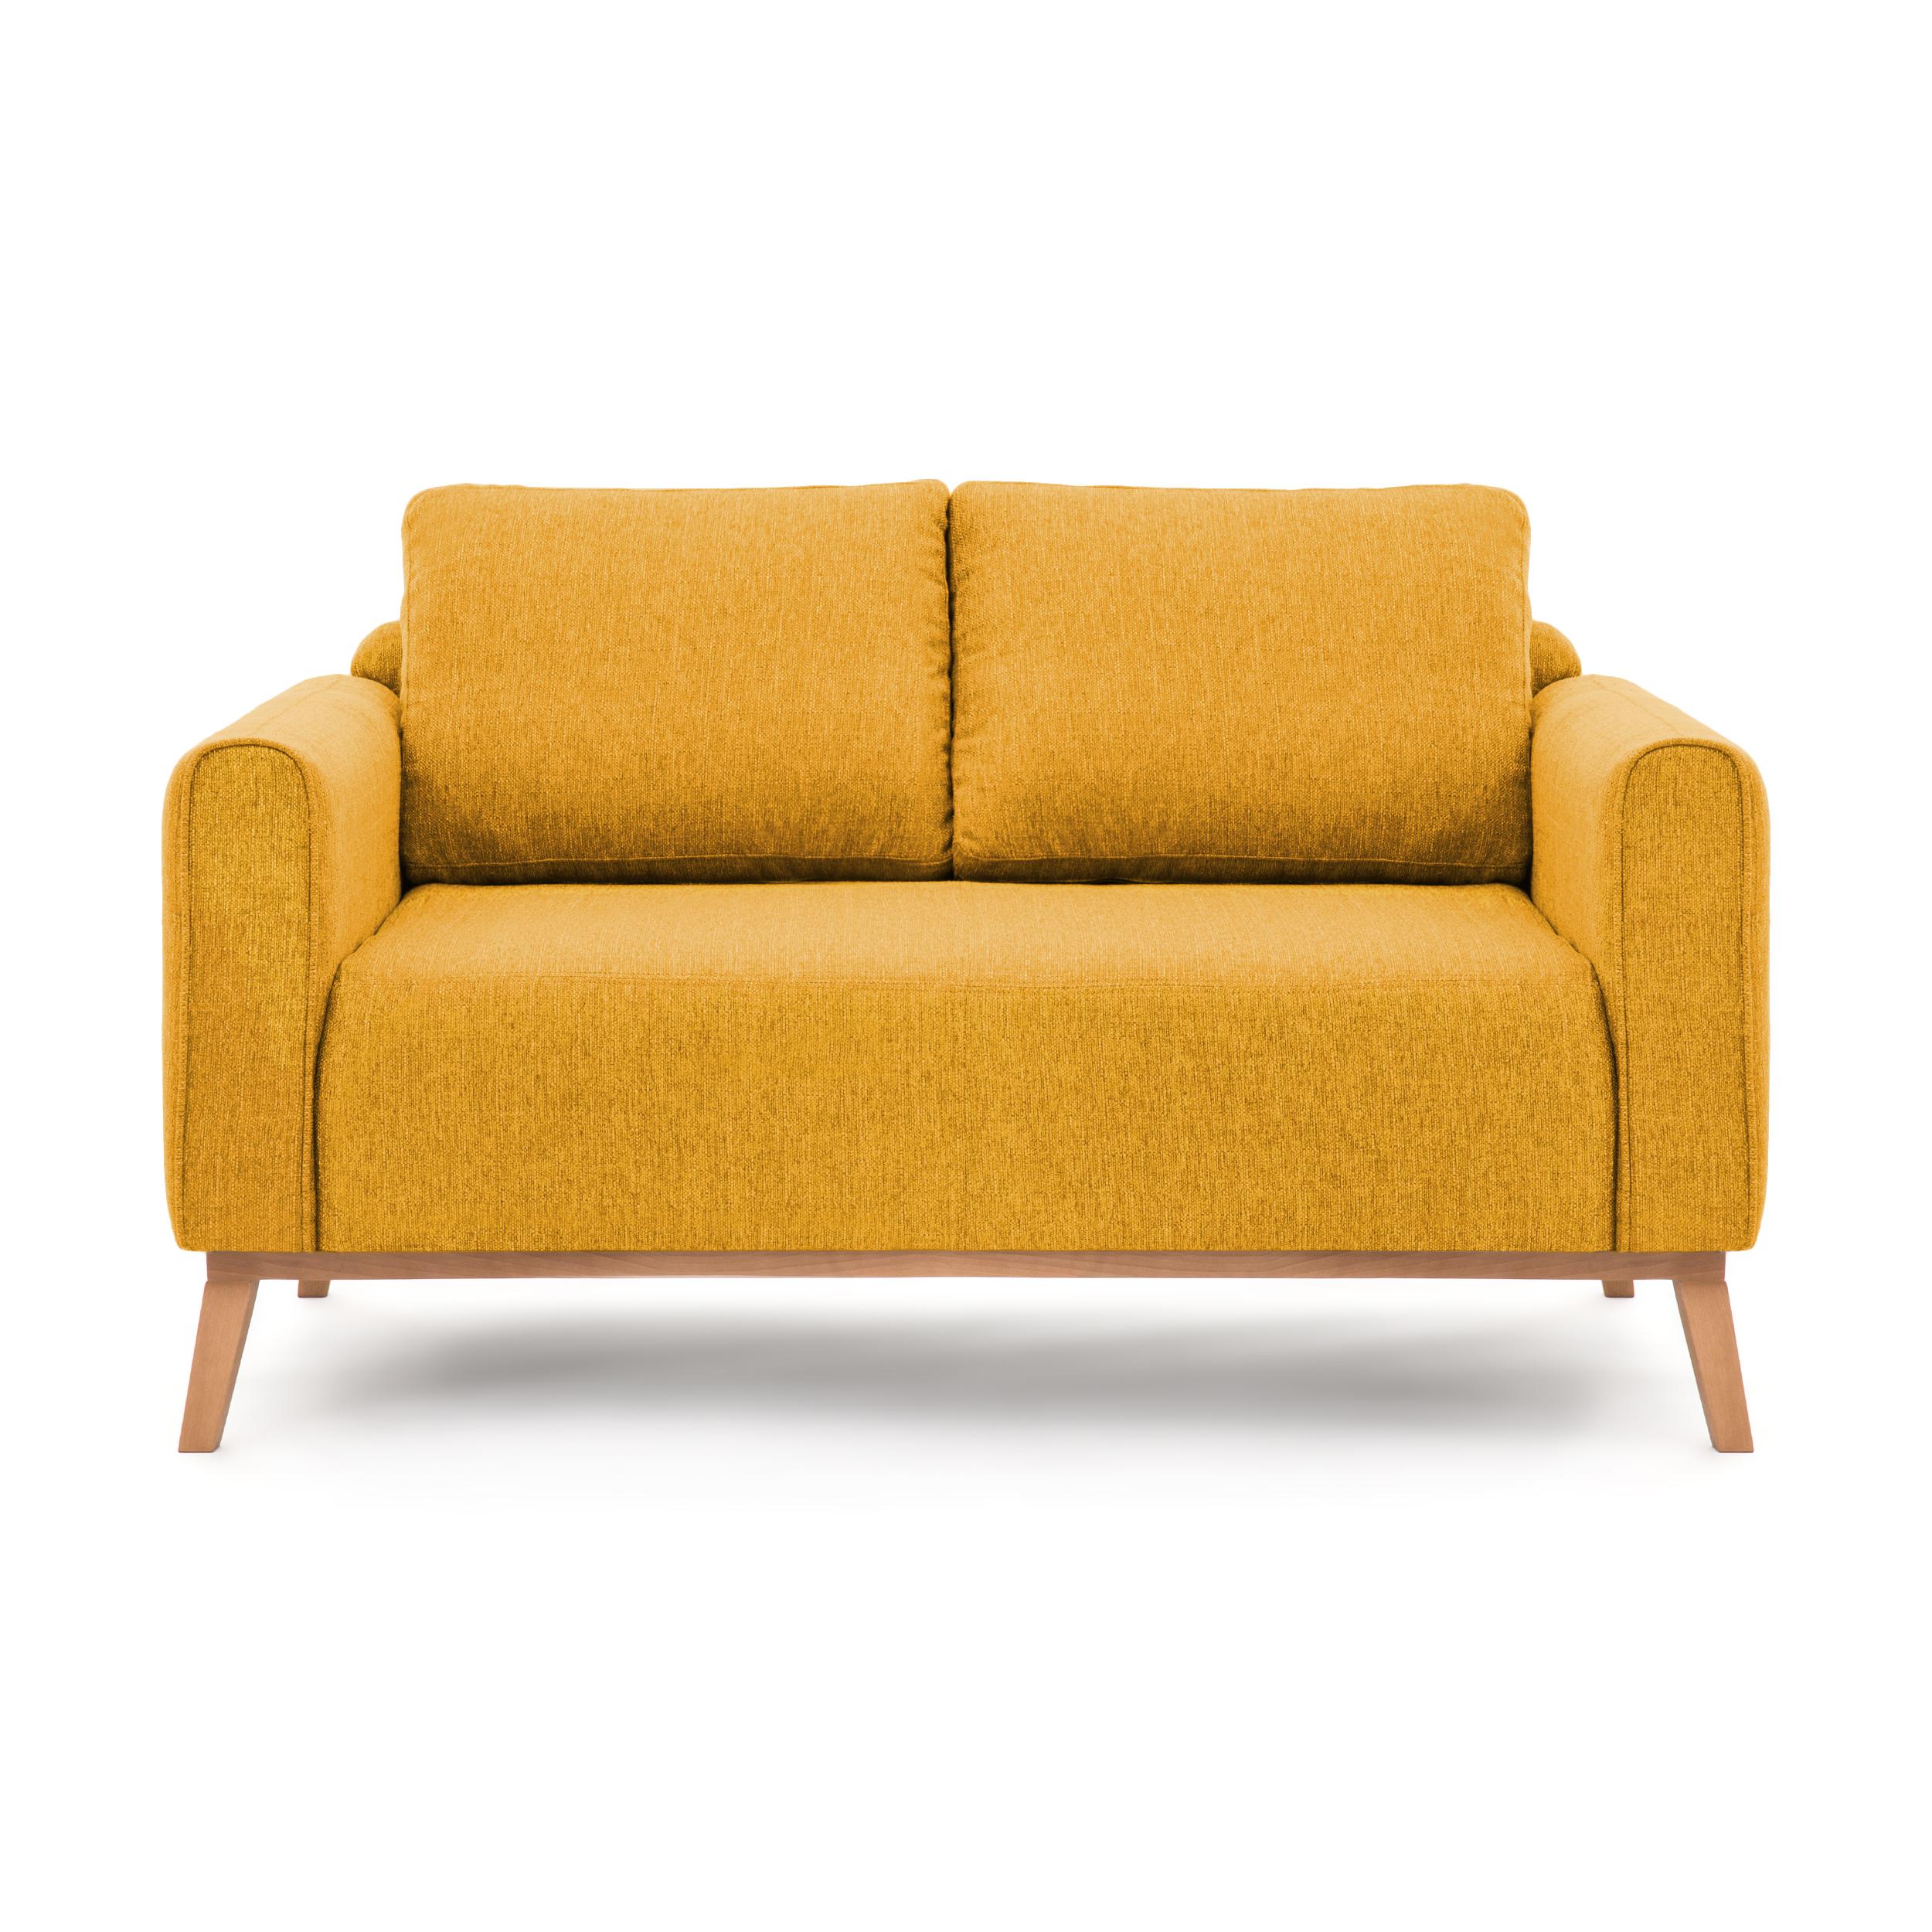 Canapea Fixa 2 locuri Milton Mustard